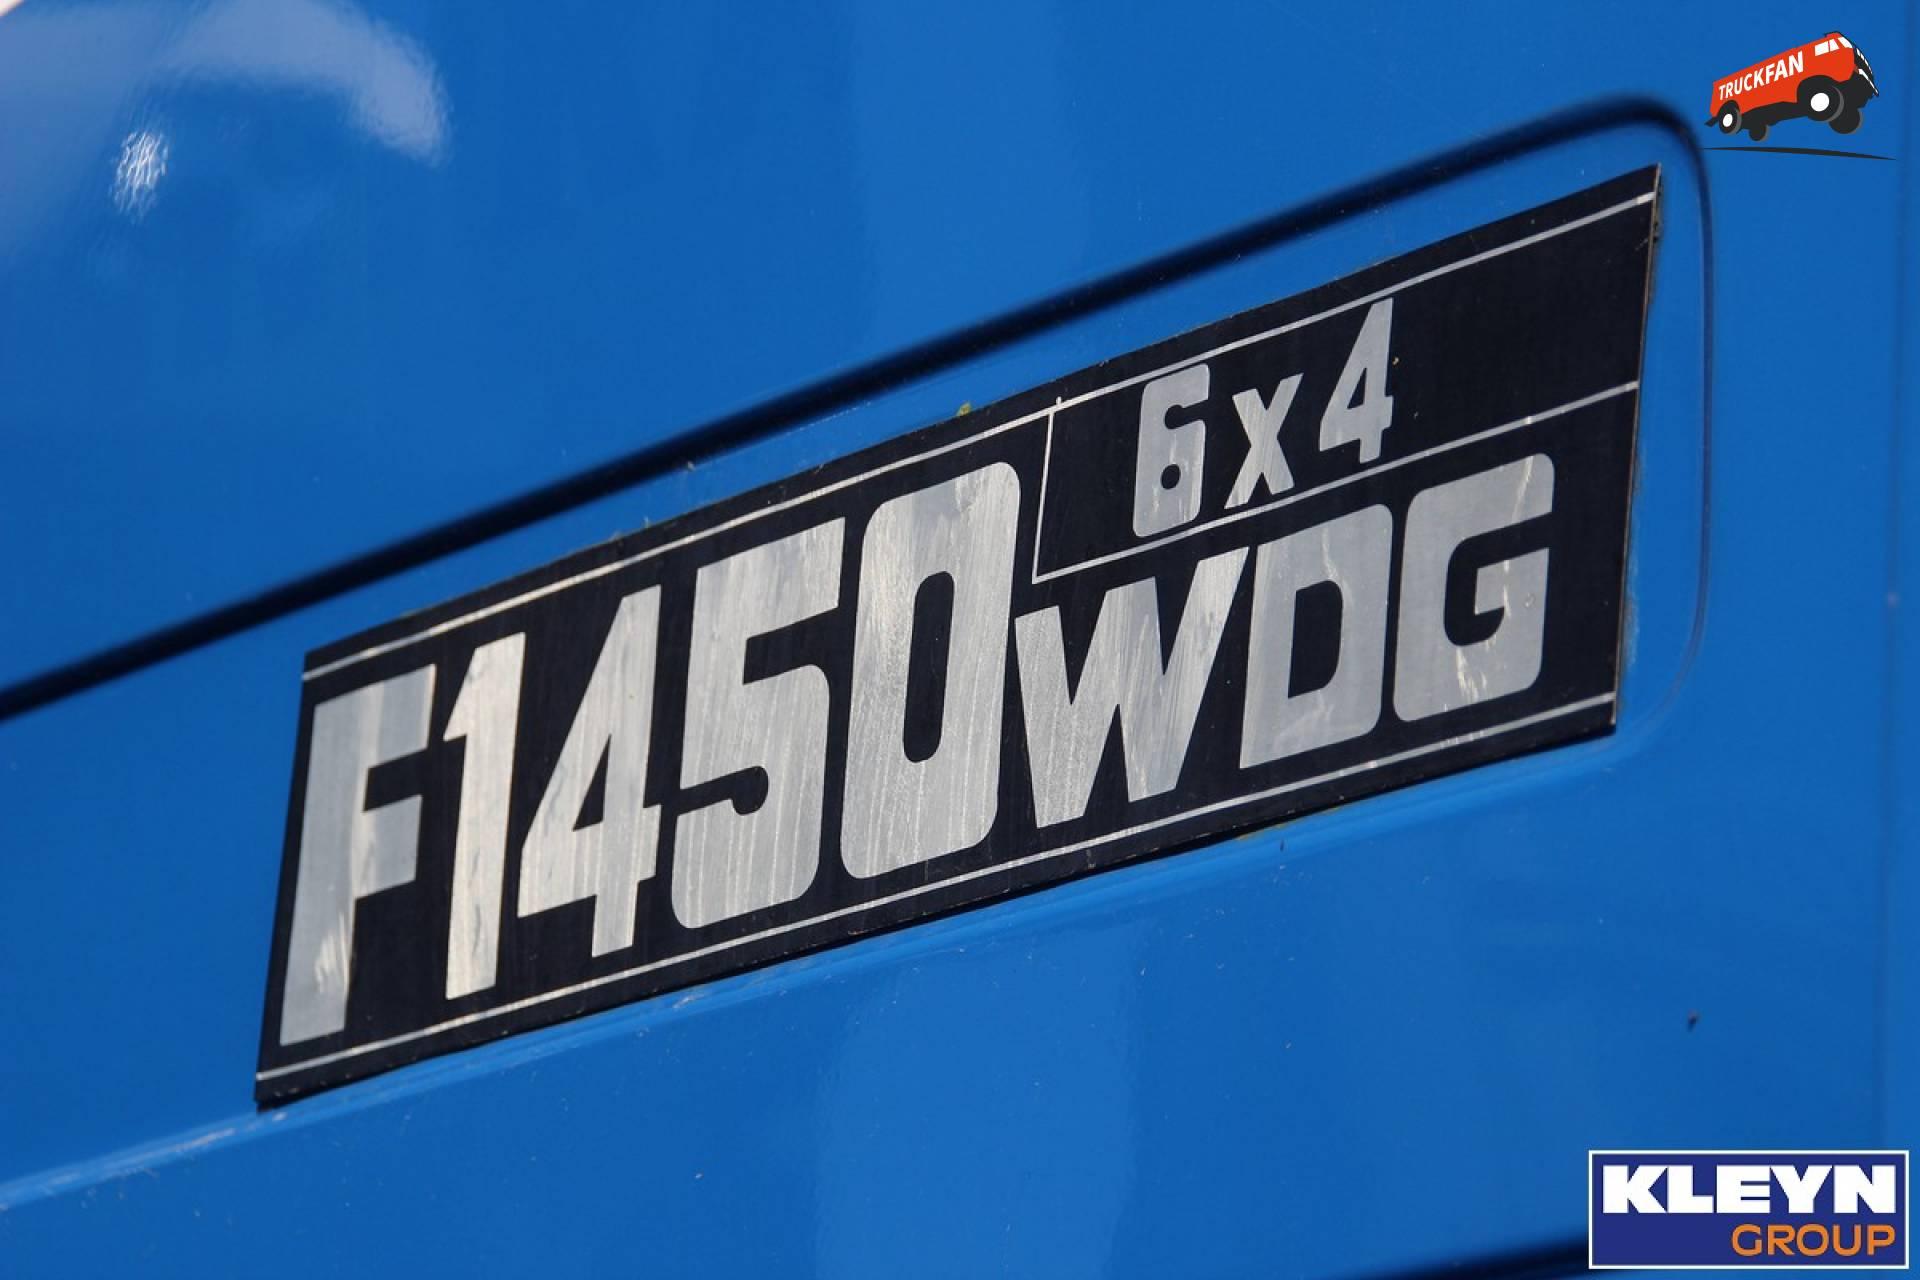 Terberg F1450